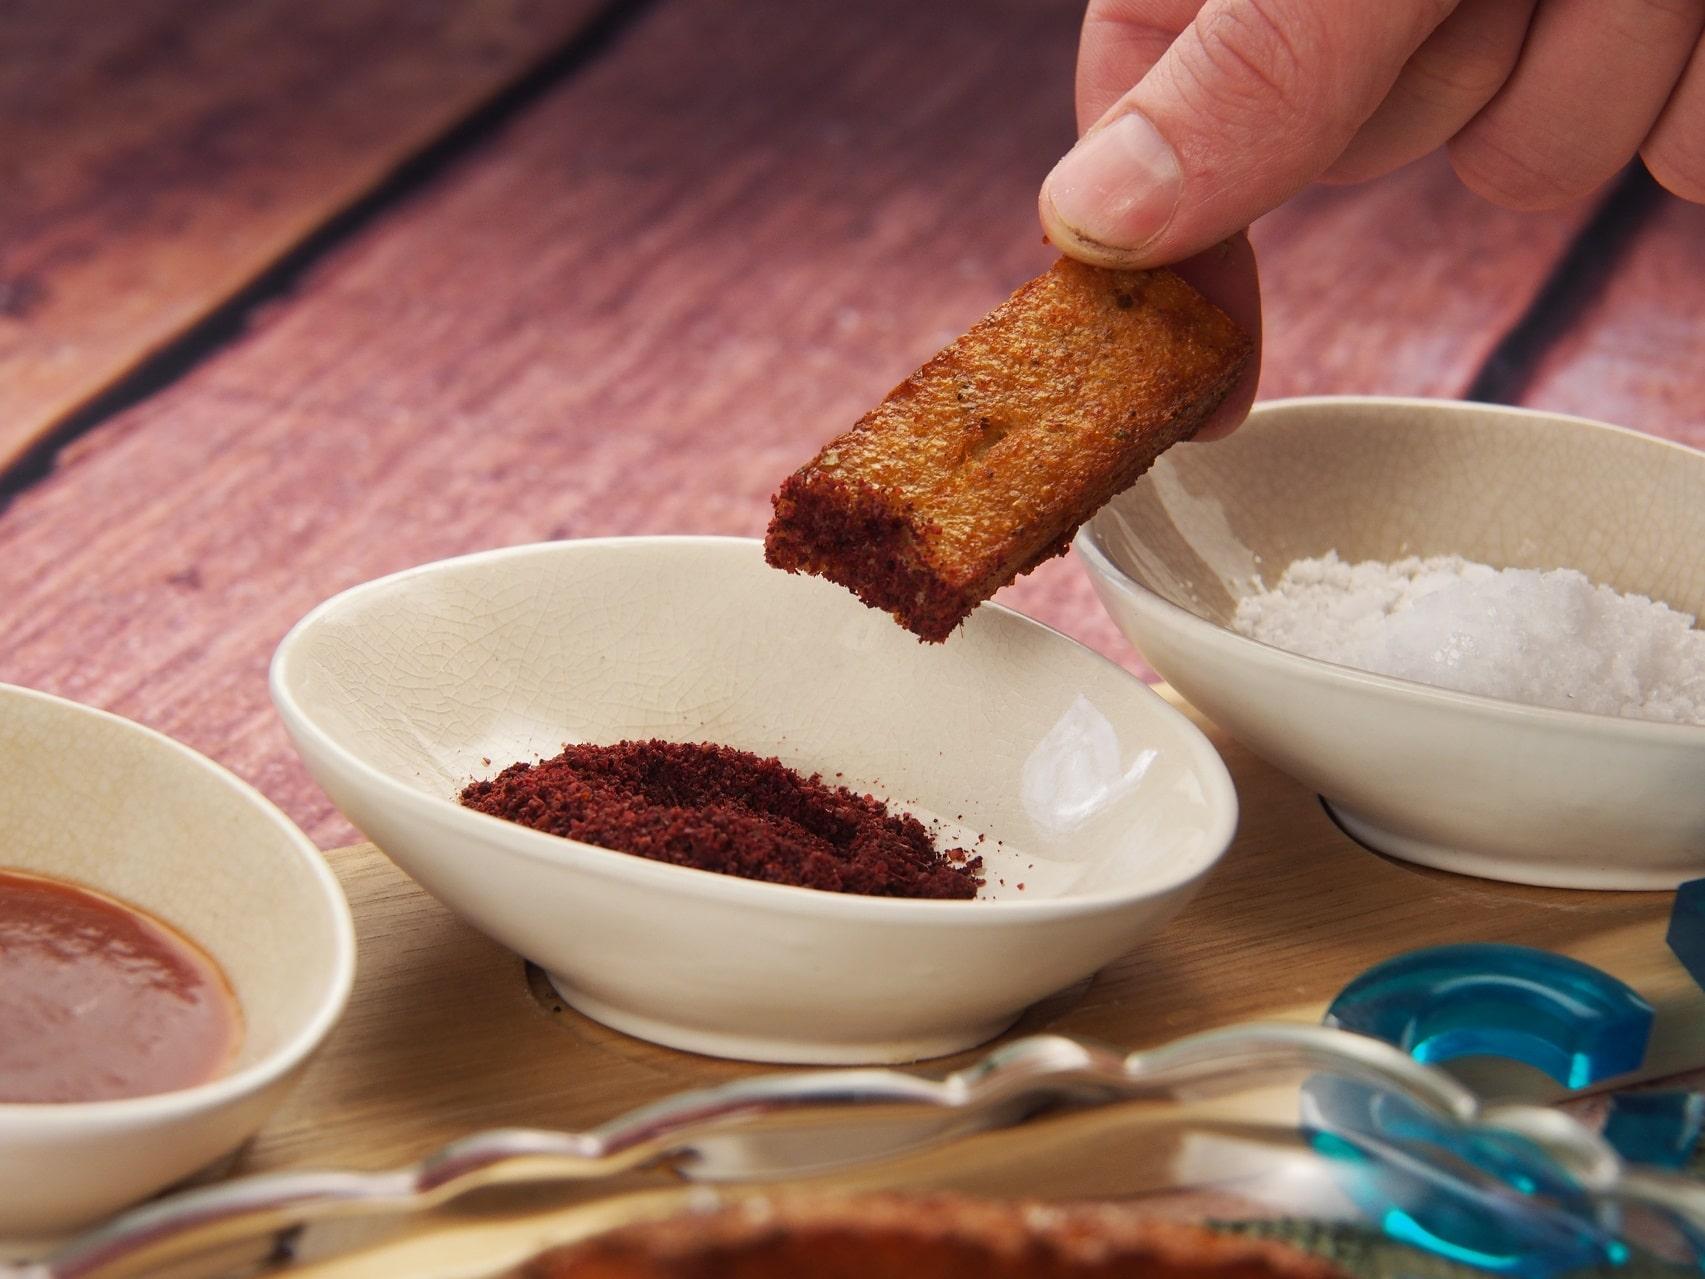 Cooking Blog - Polenta Chips with Sumac 9